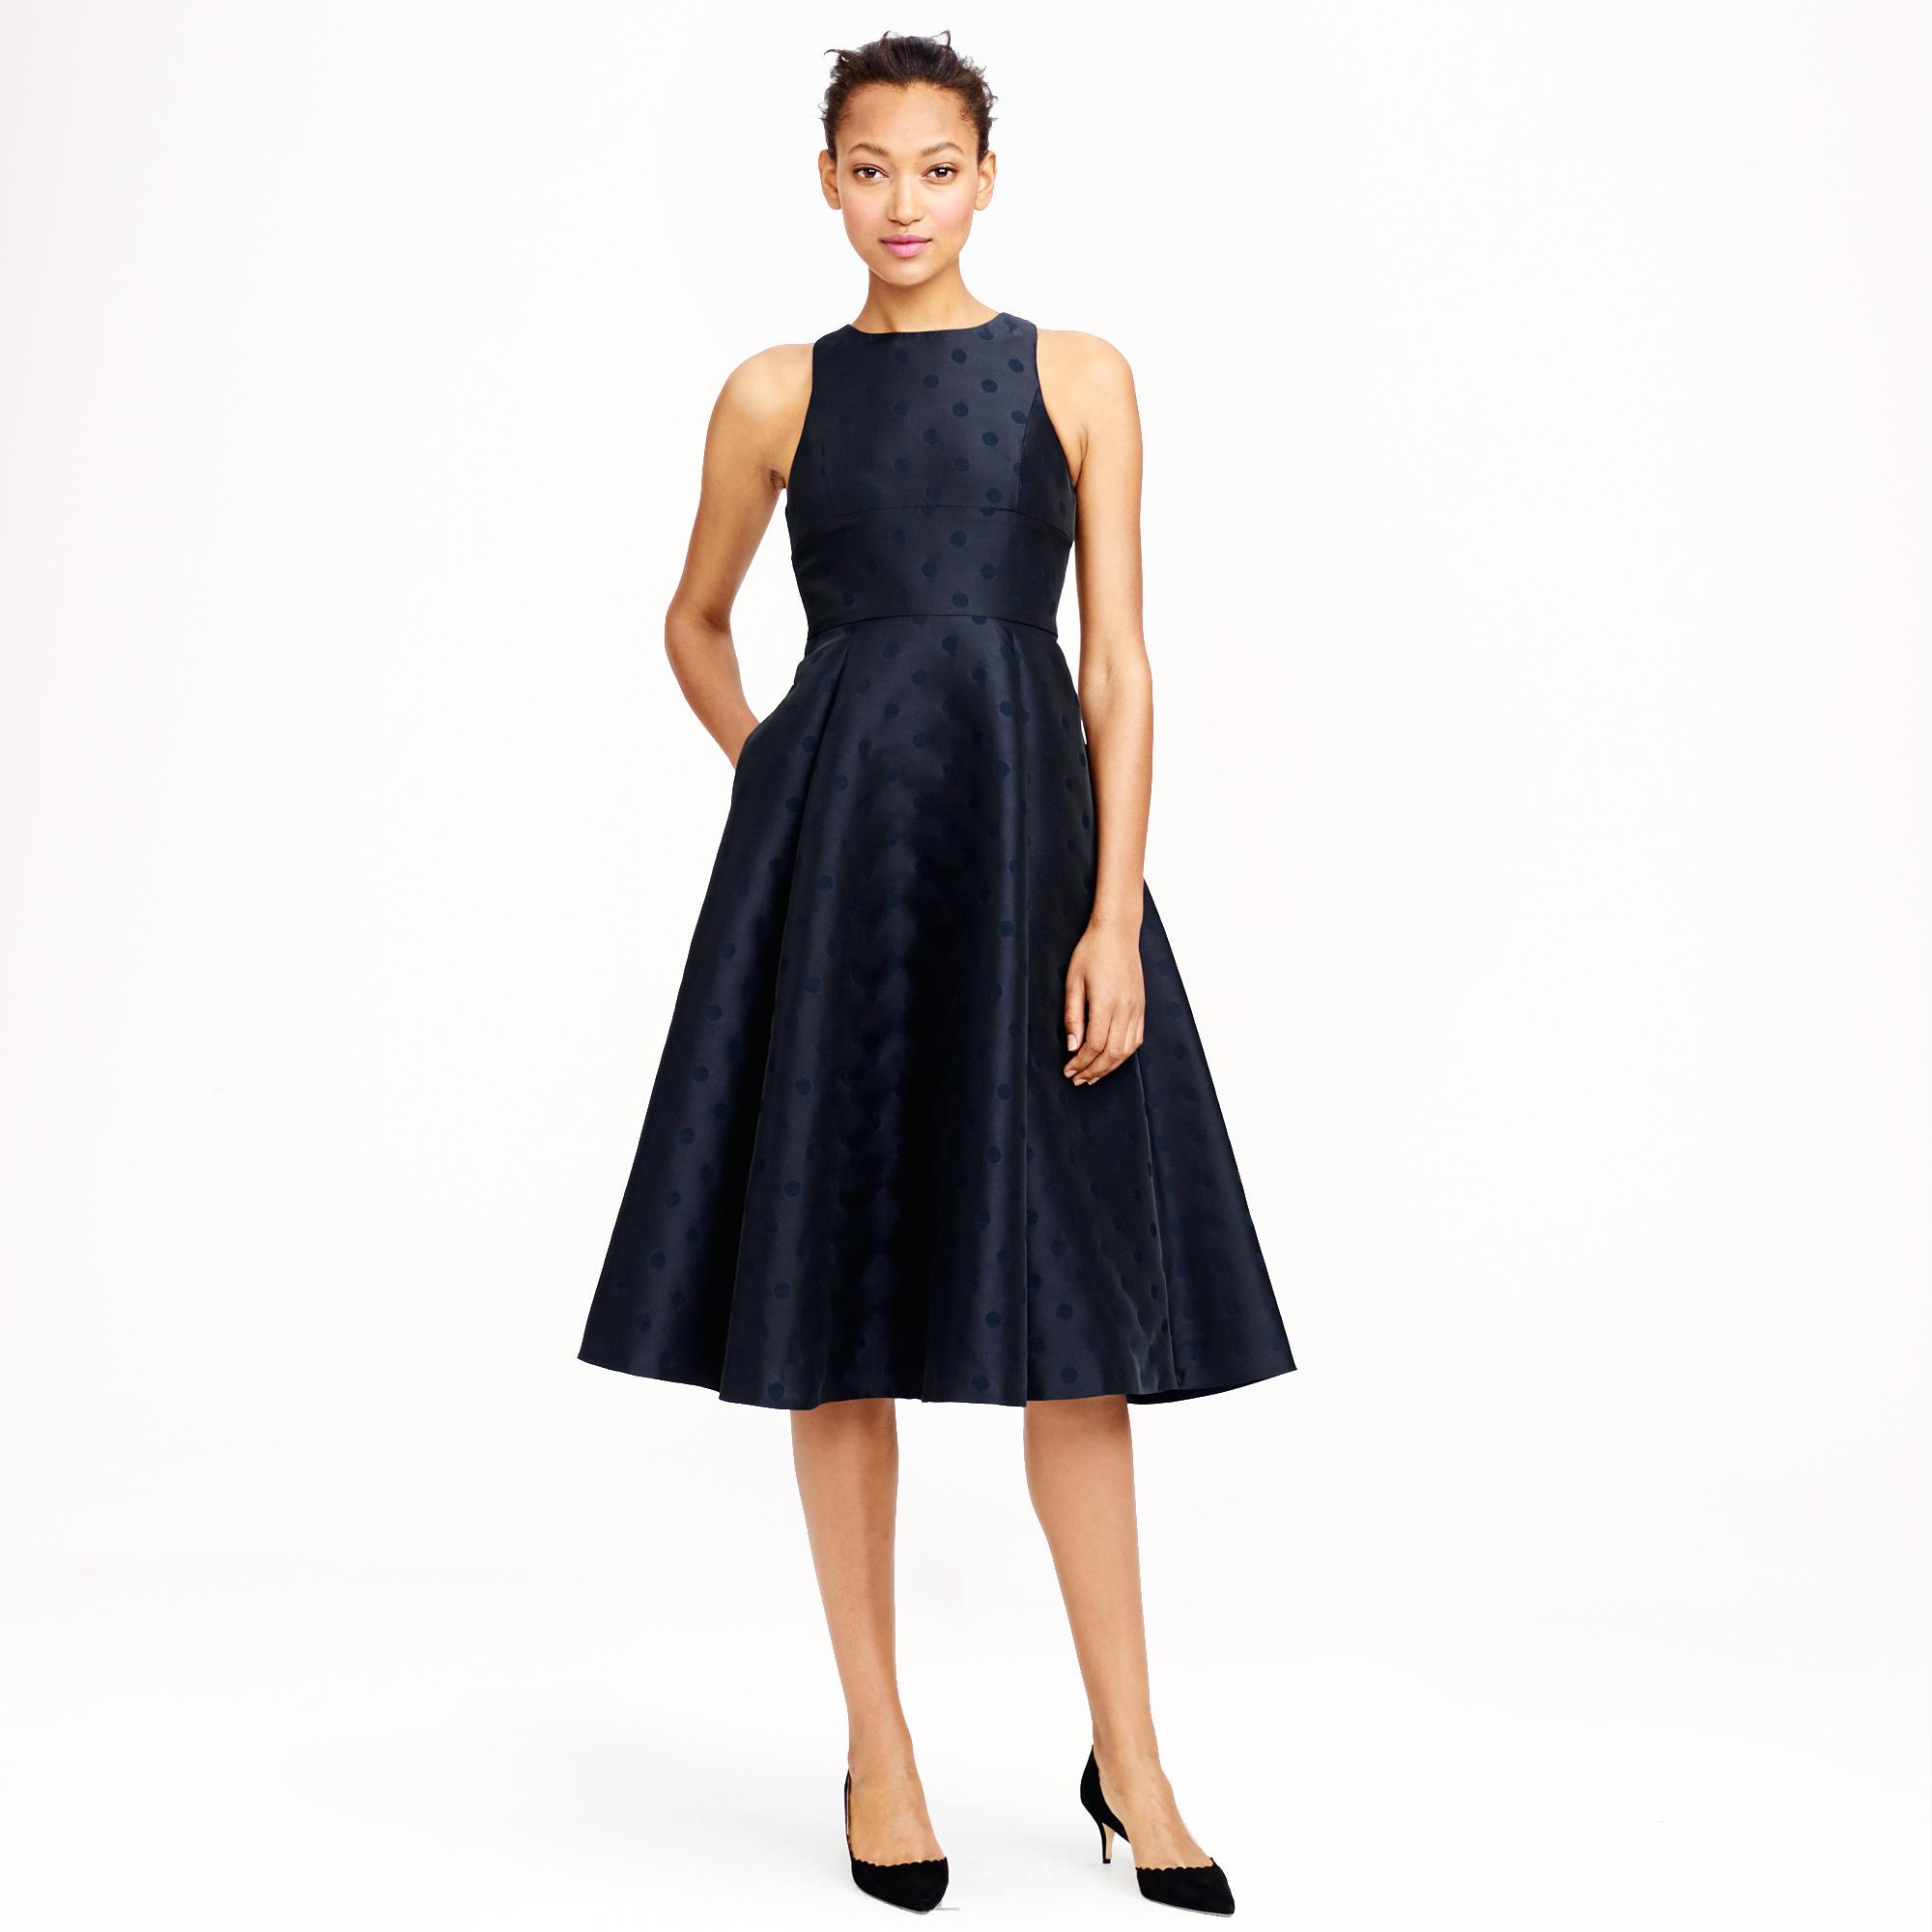 Black dress j crew - Collection Jacquard Dot Dress